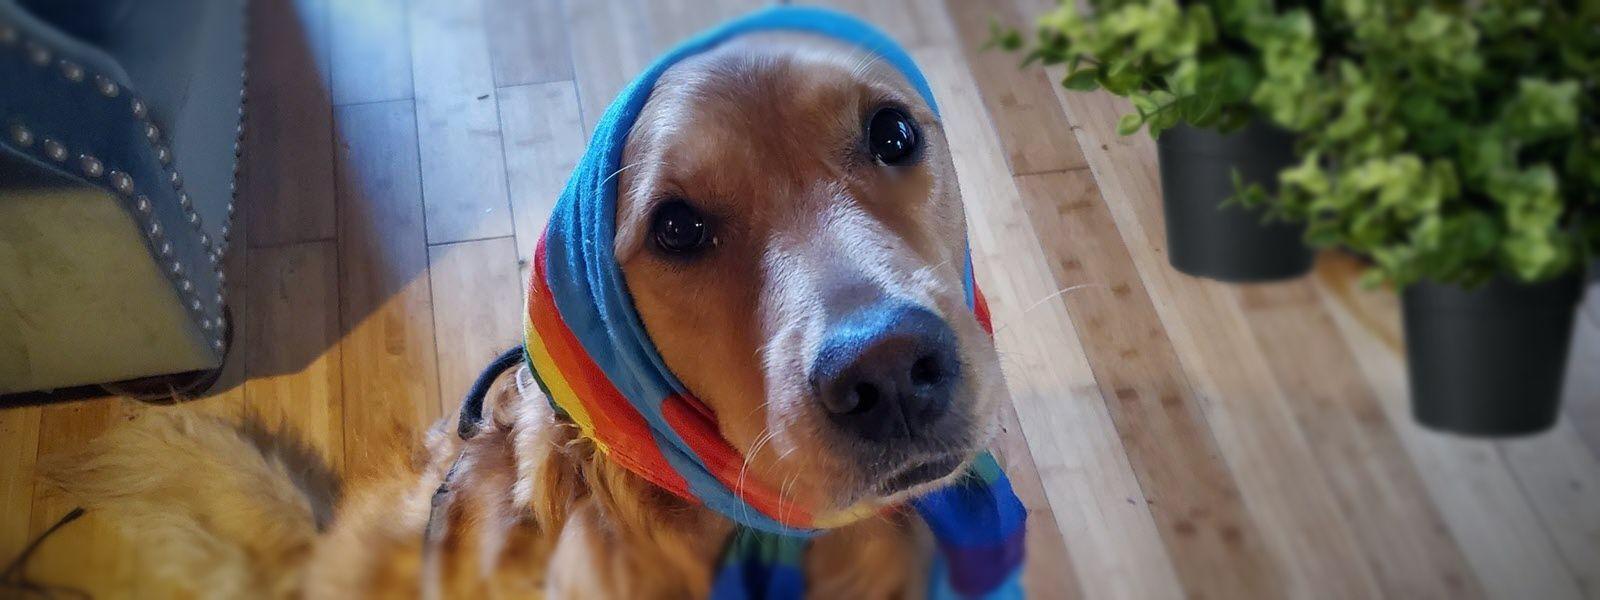 /trump-era-politics-took-my-dogs-best-friend-893n3w82 feature image